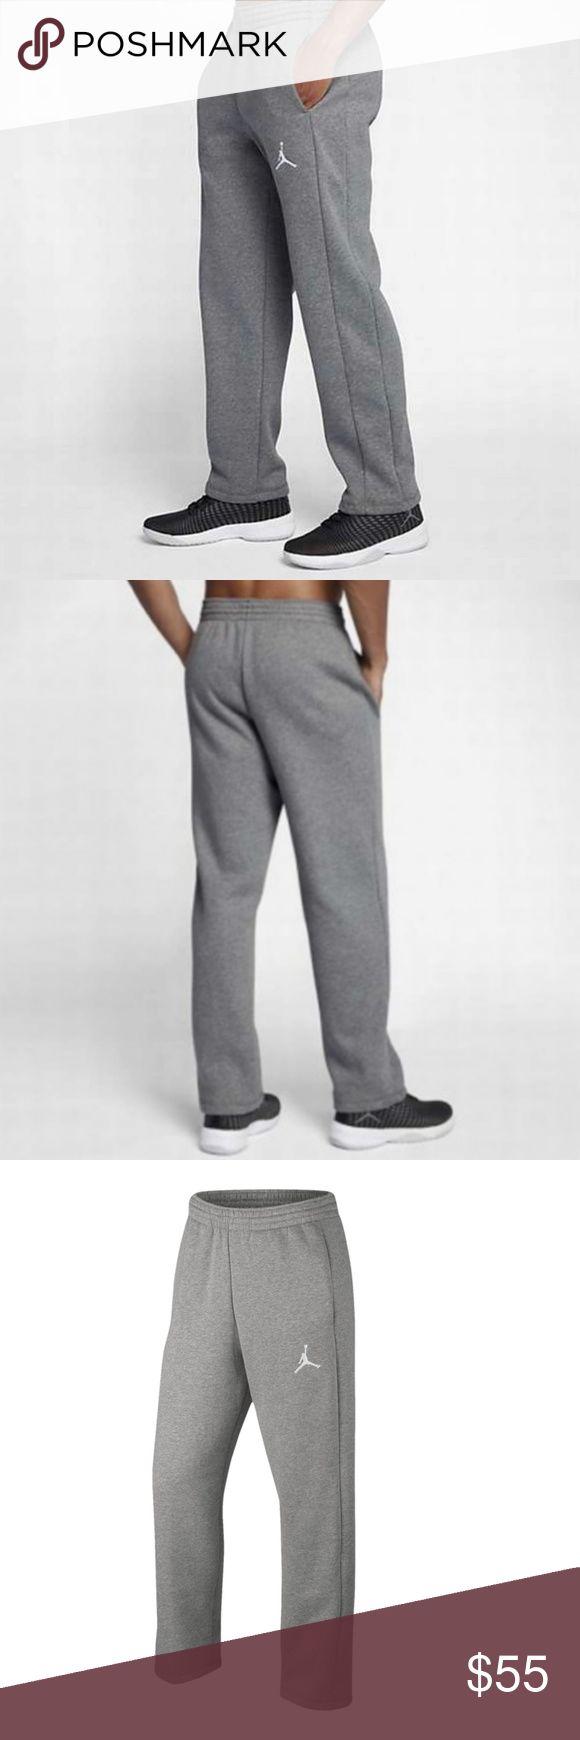 Jordan Jumpman Flight Men's Basketball Pants New With Tags 100% Authentic, Guaranteed!  Jordan Jumpman Flight Men's Basketball Pants   Elastic waistband with drawcord for a snug, comfortable fit.  Side pockets  Men's Size Small  Color: Gray Style 823073-063 Jordan Pants Sweatpants & Joggers